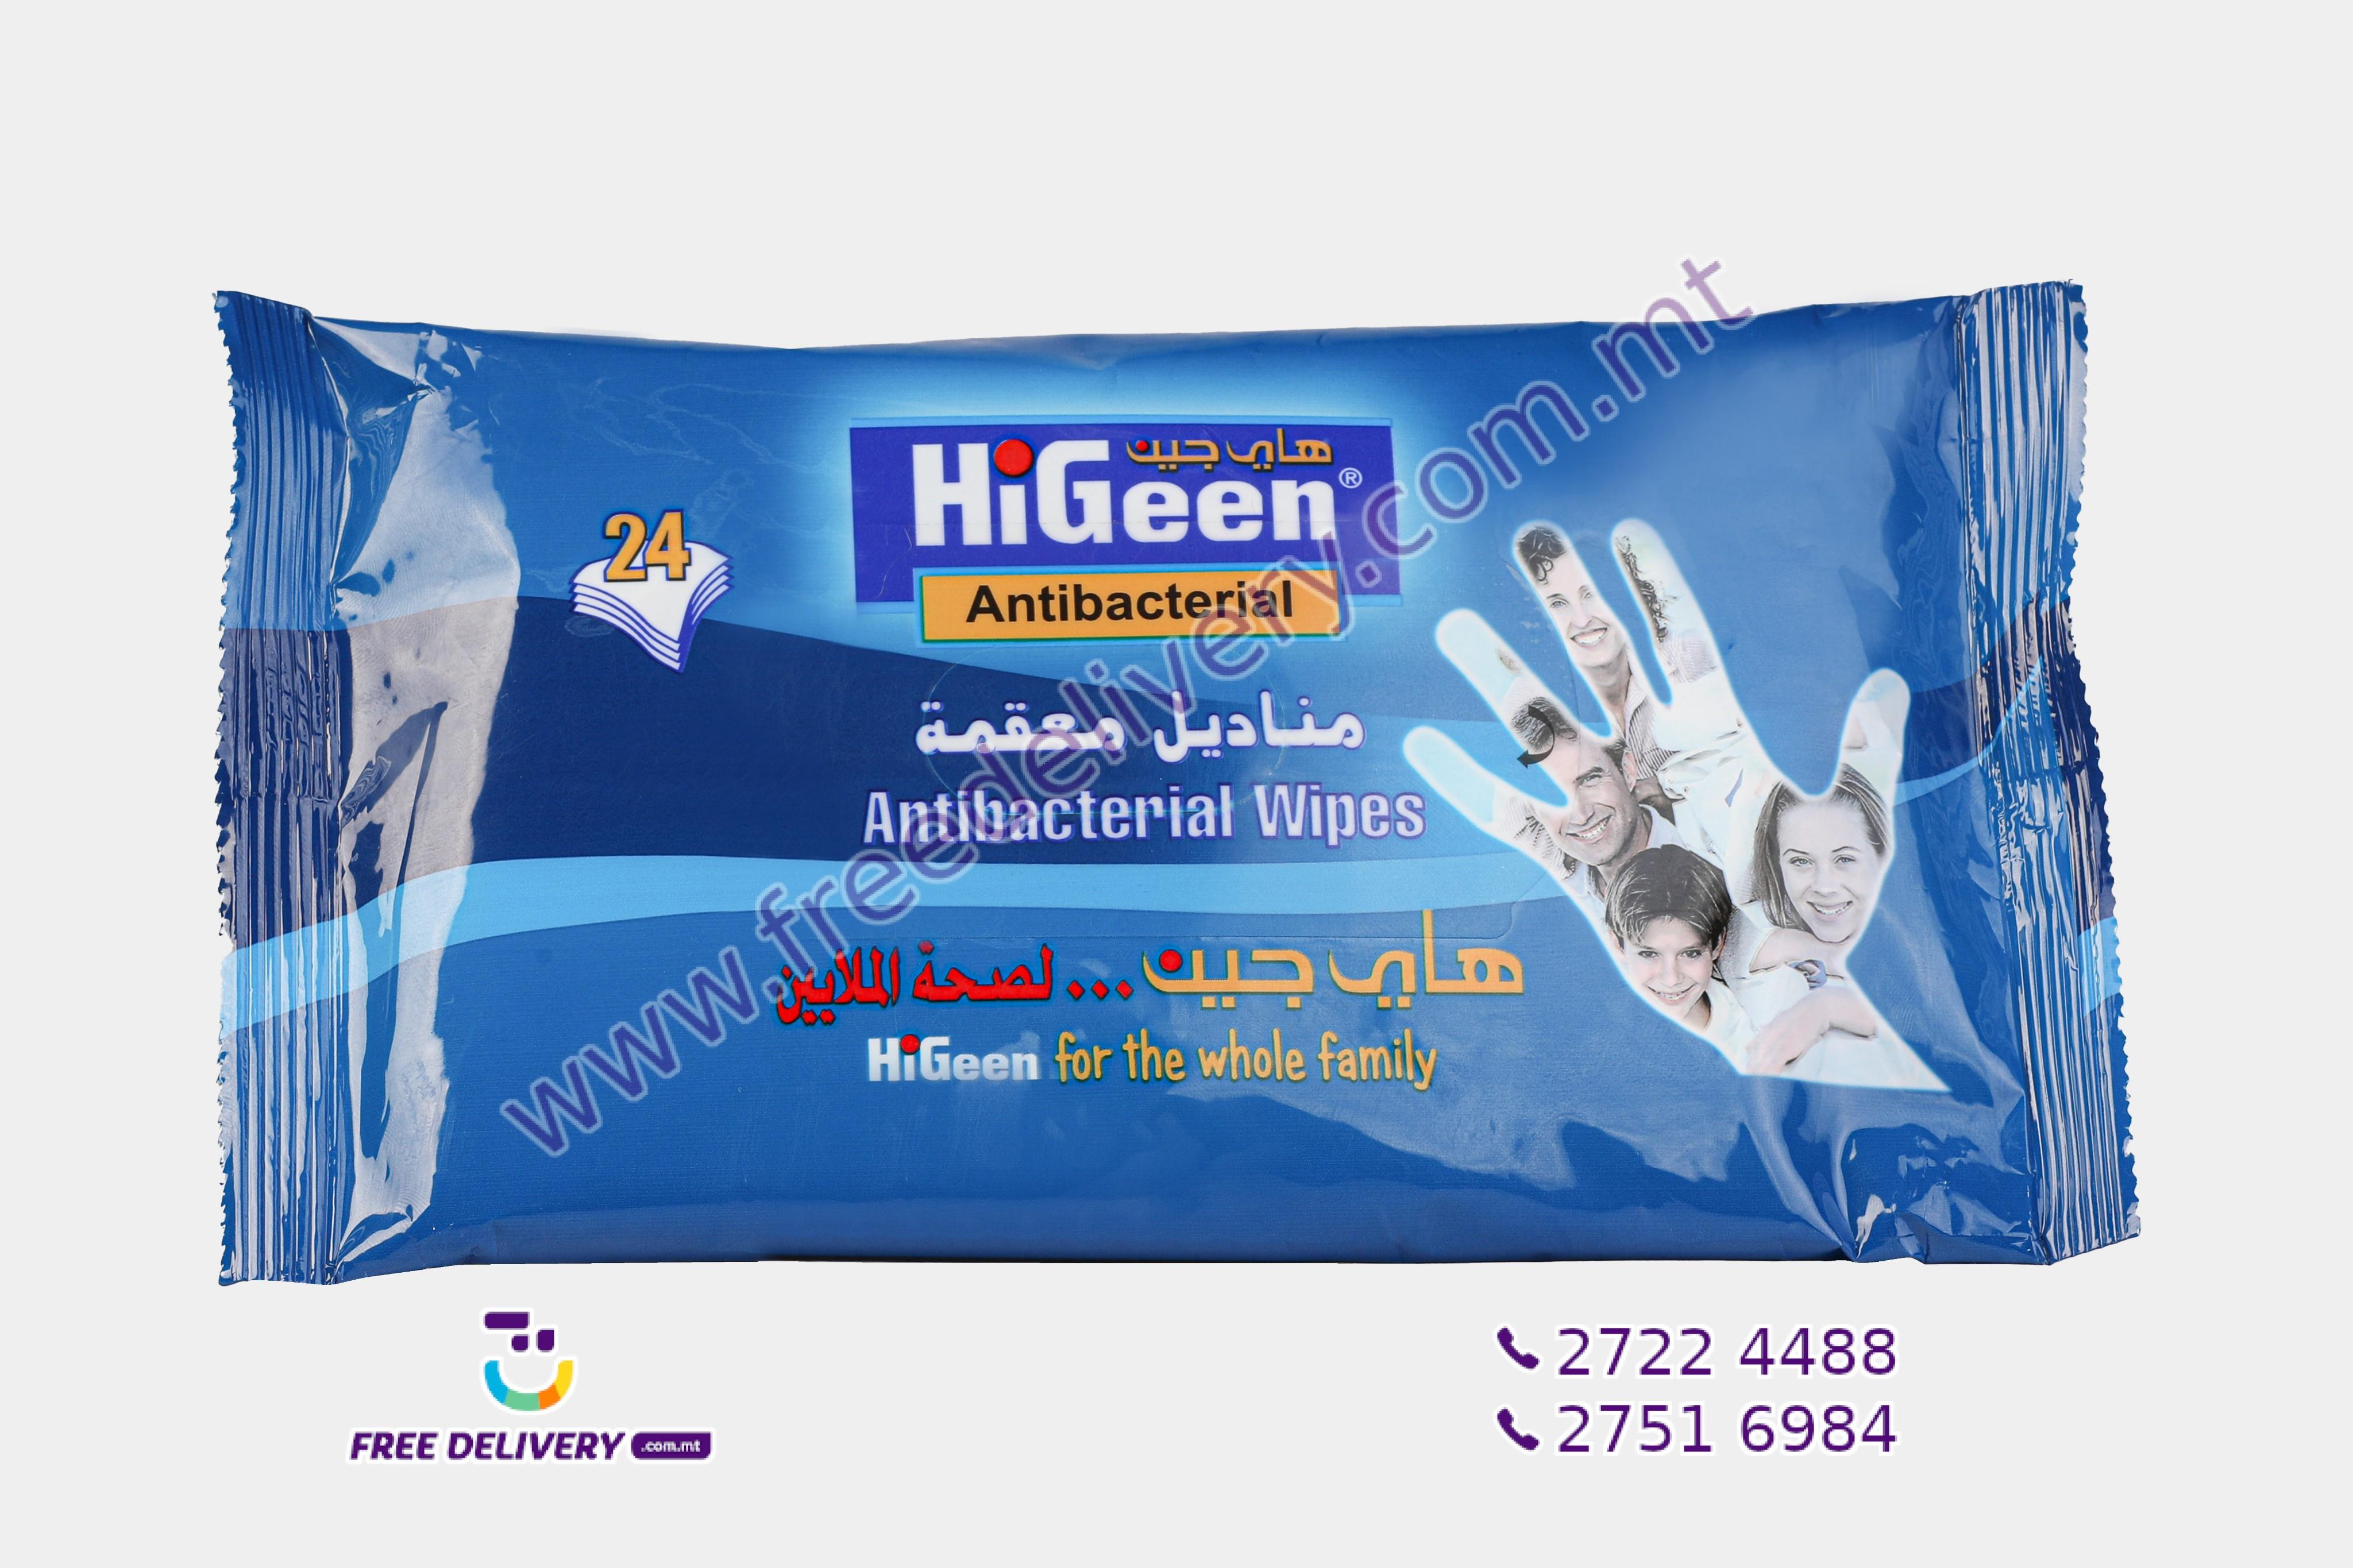 HIGEEN ANTI-BACTERIAL WIPES (24 WIPES) HI970207